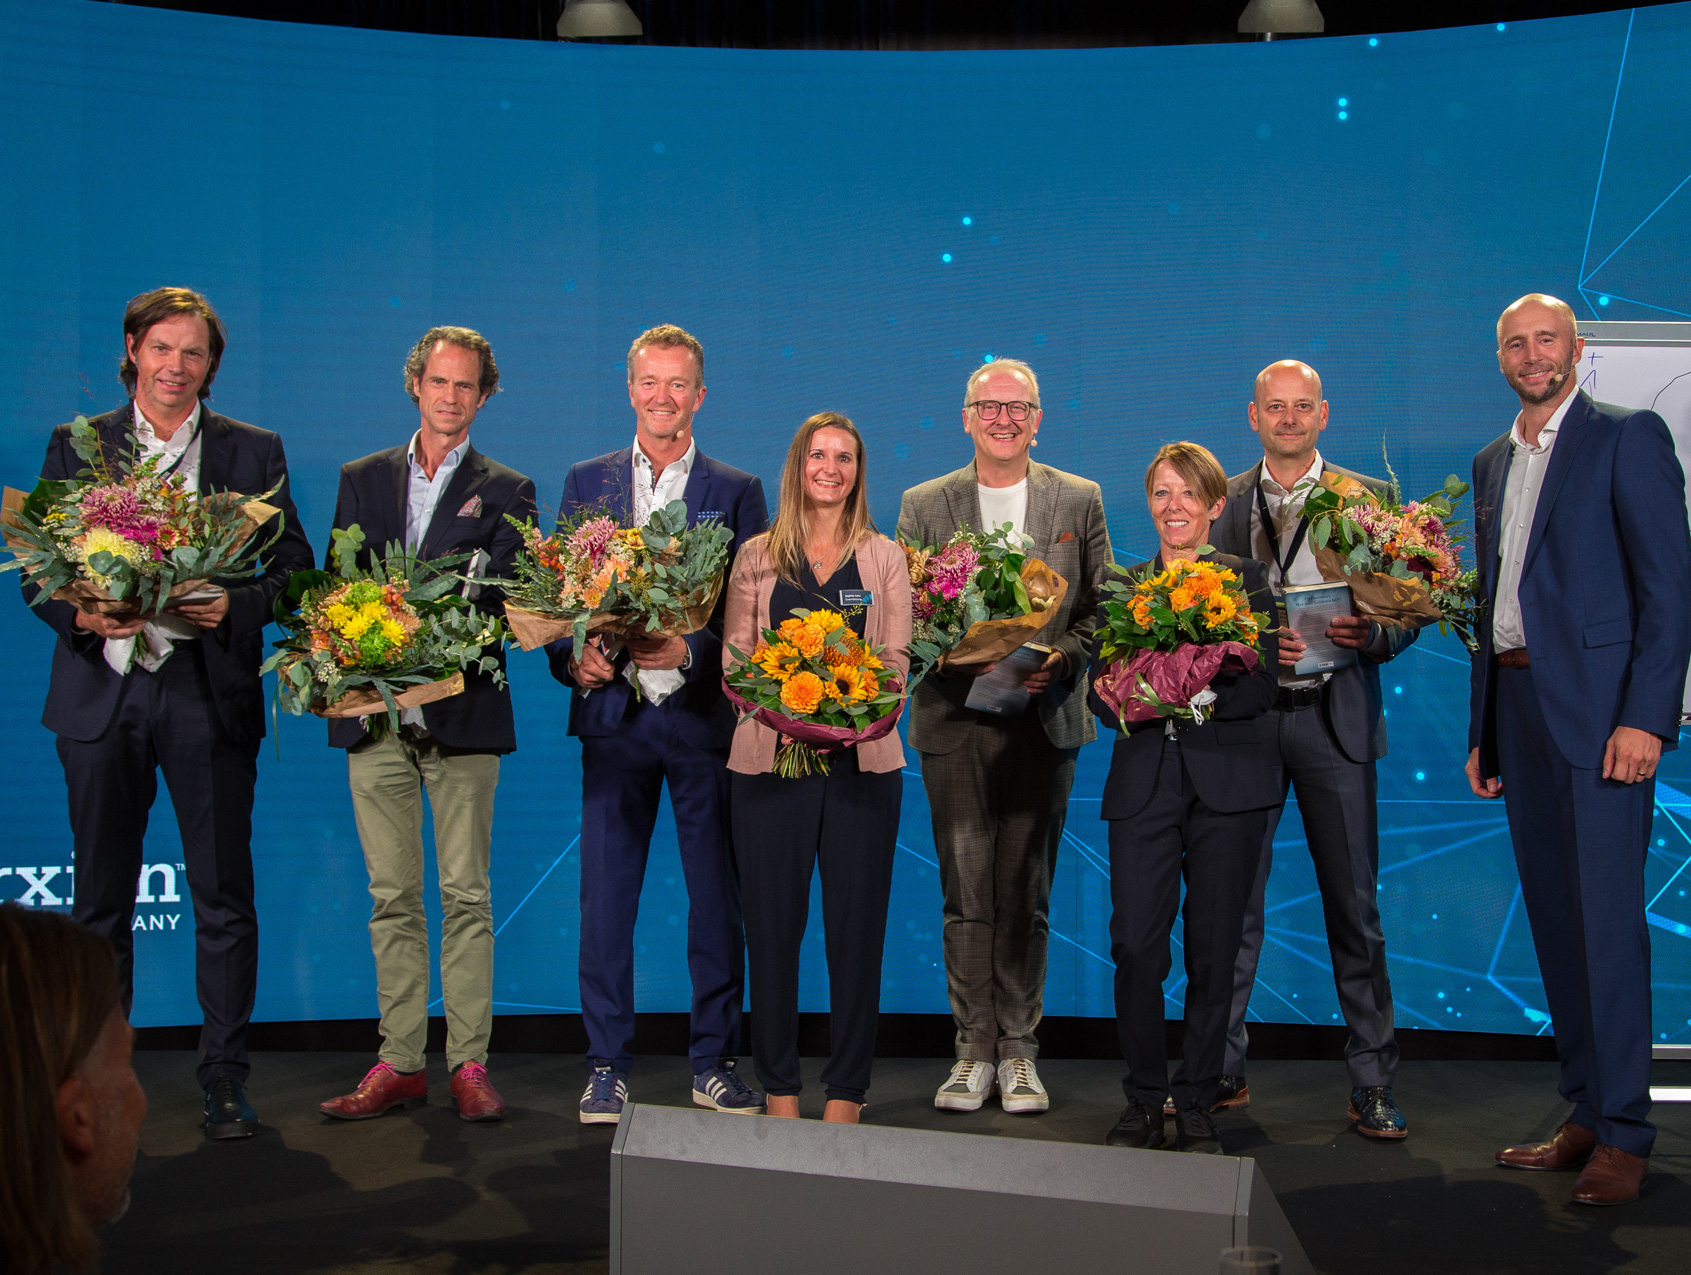 Frankfurter IT Symposium 2021